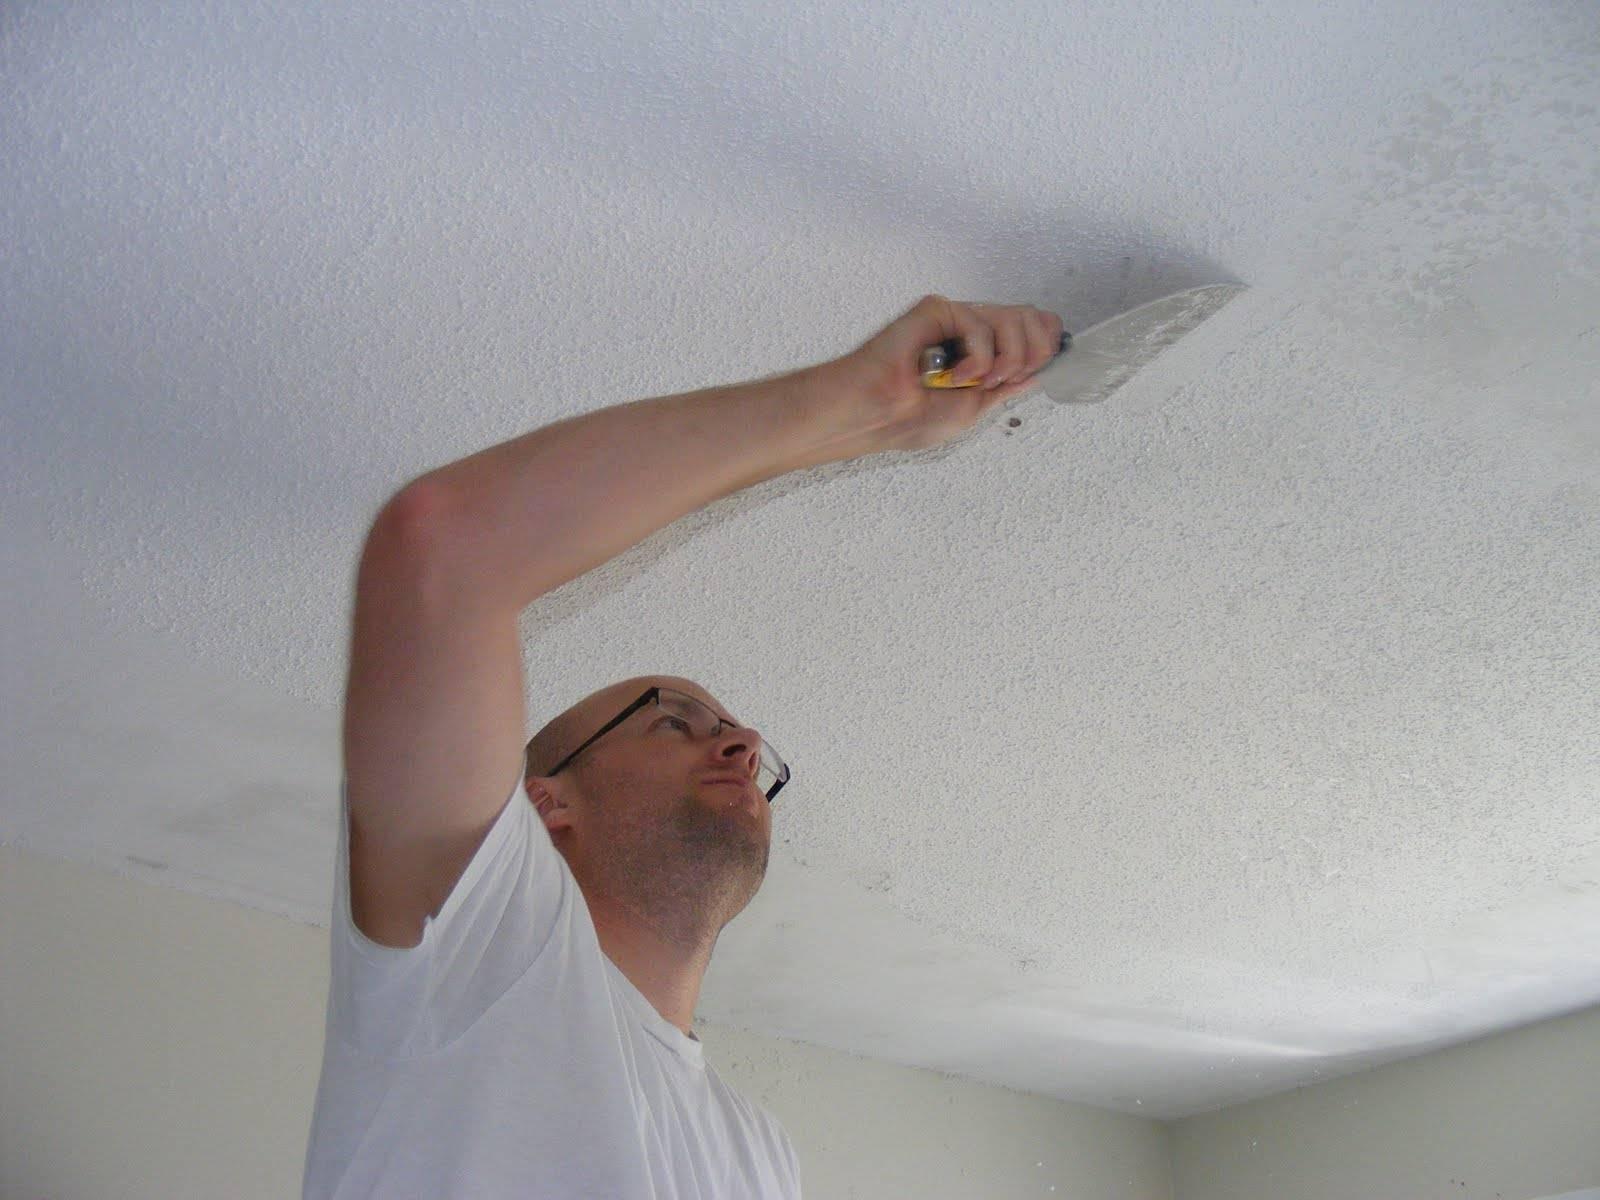 Полная шпаклевка потолка на кухне | ремонт кухни своими руками | remont-kuxni.ru